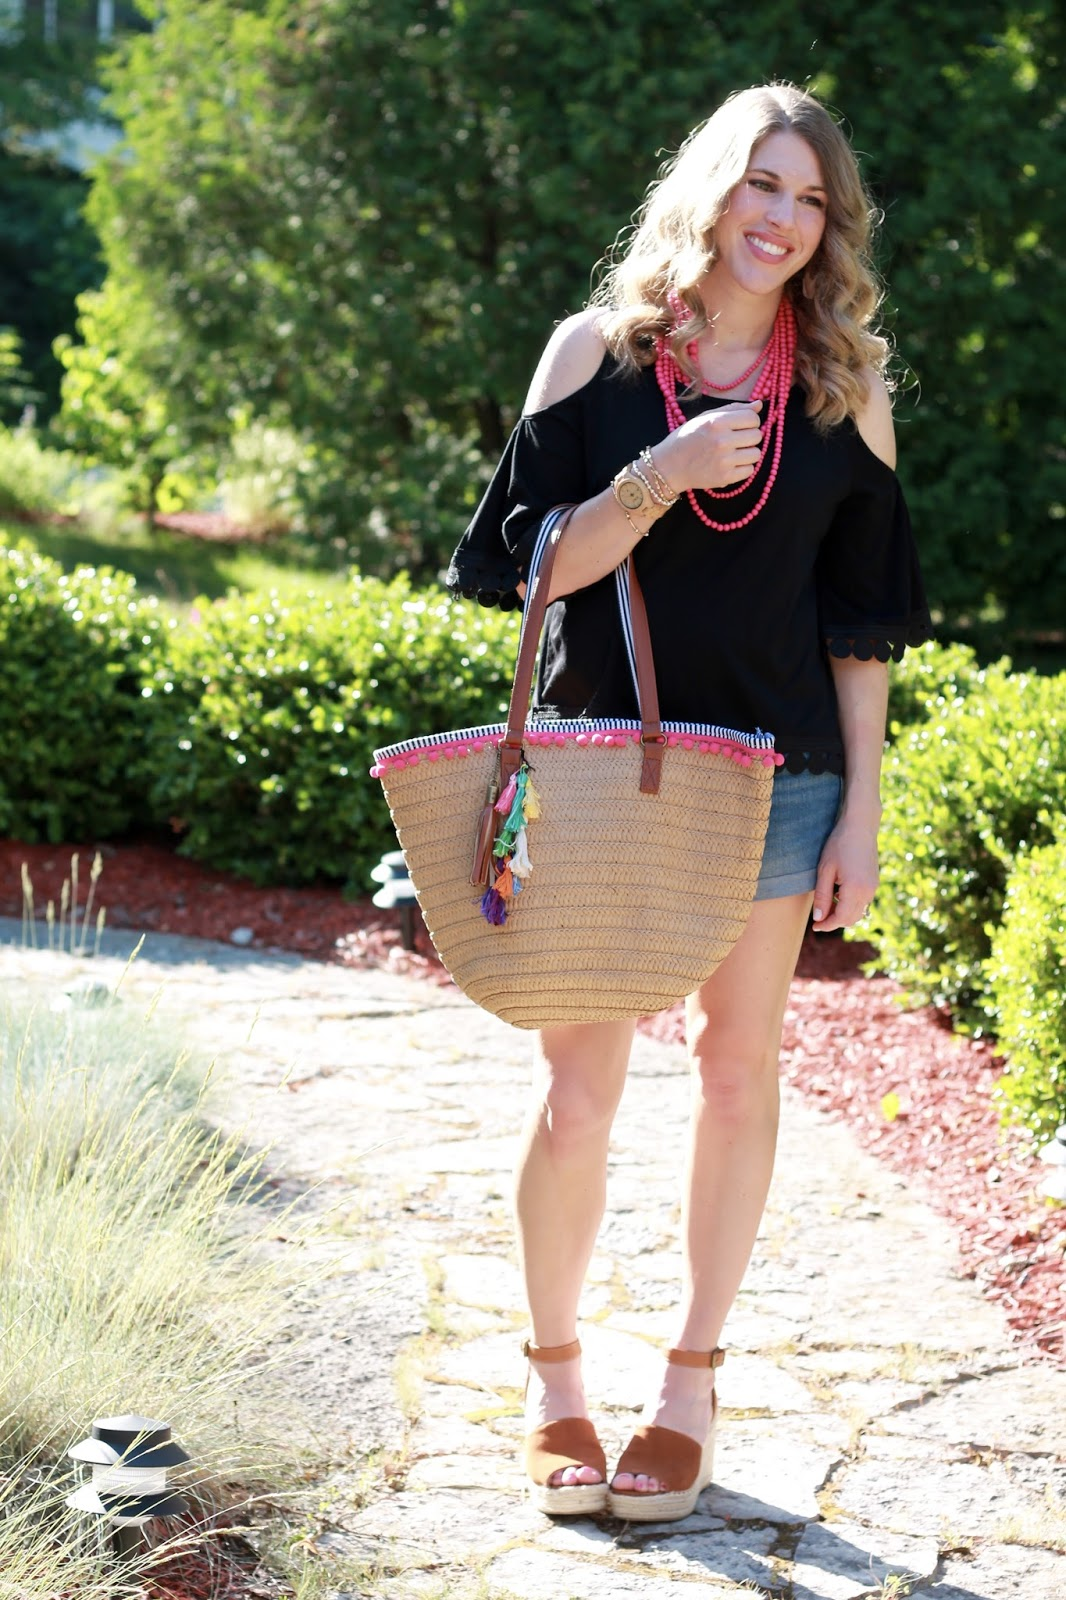 black cold shoulder top, jean shorts, tassel straw tote, steve madden wedge sandals, pink statement necklace, second trimester, summer maternity outfit